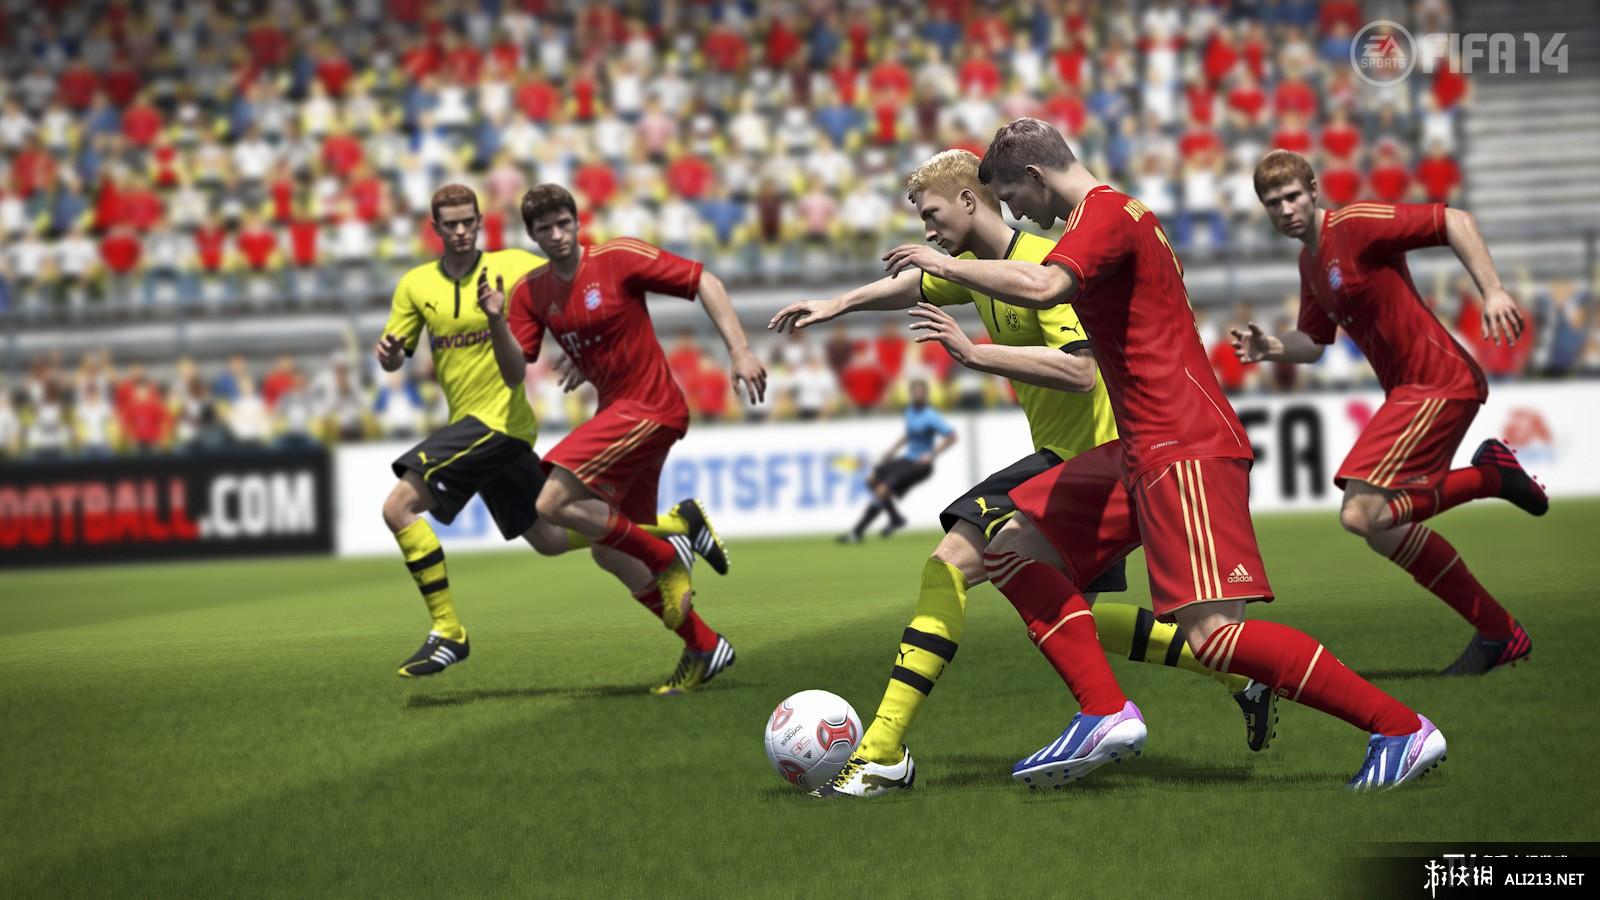 《FIFA 14》WII截图